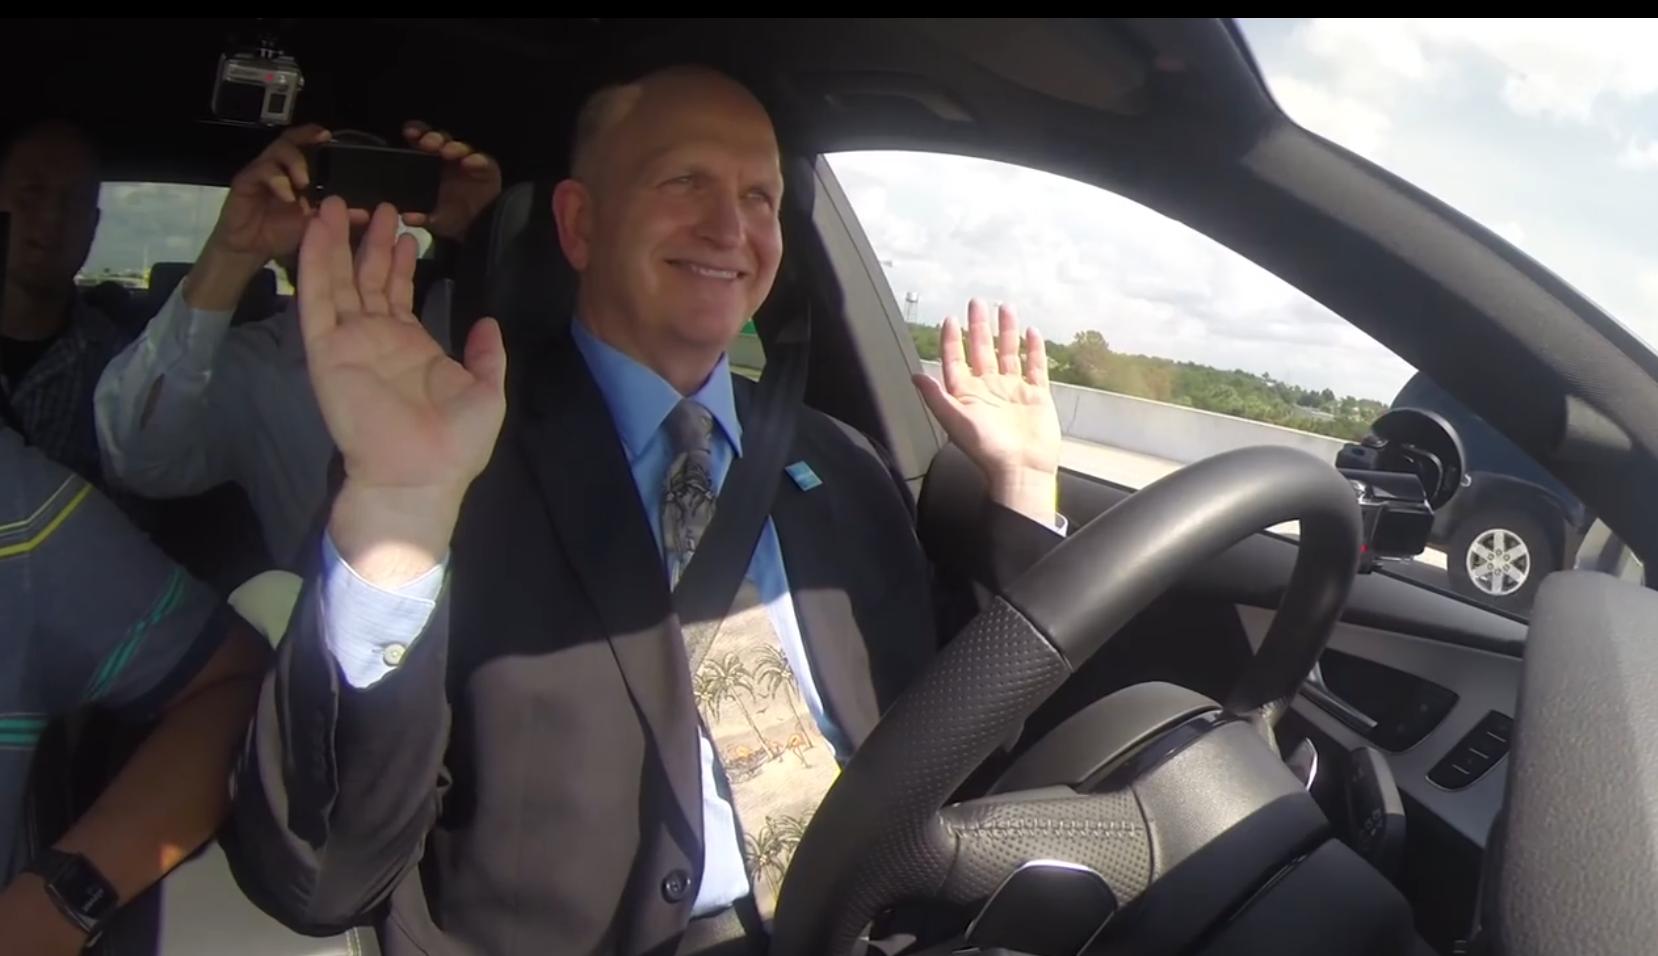 Audi Piloted Driving Gouverneur von Florida am Steuer - Audi A7: Totalausfall beim autonomen Fahren mit dem Gouverneur von Florida!